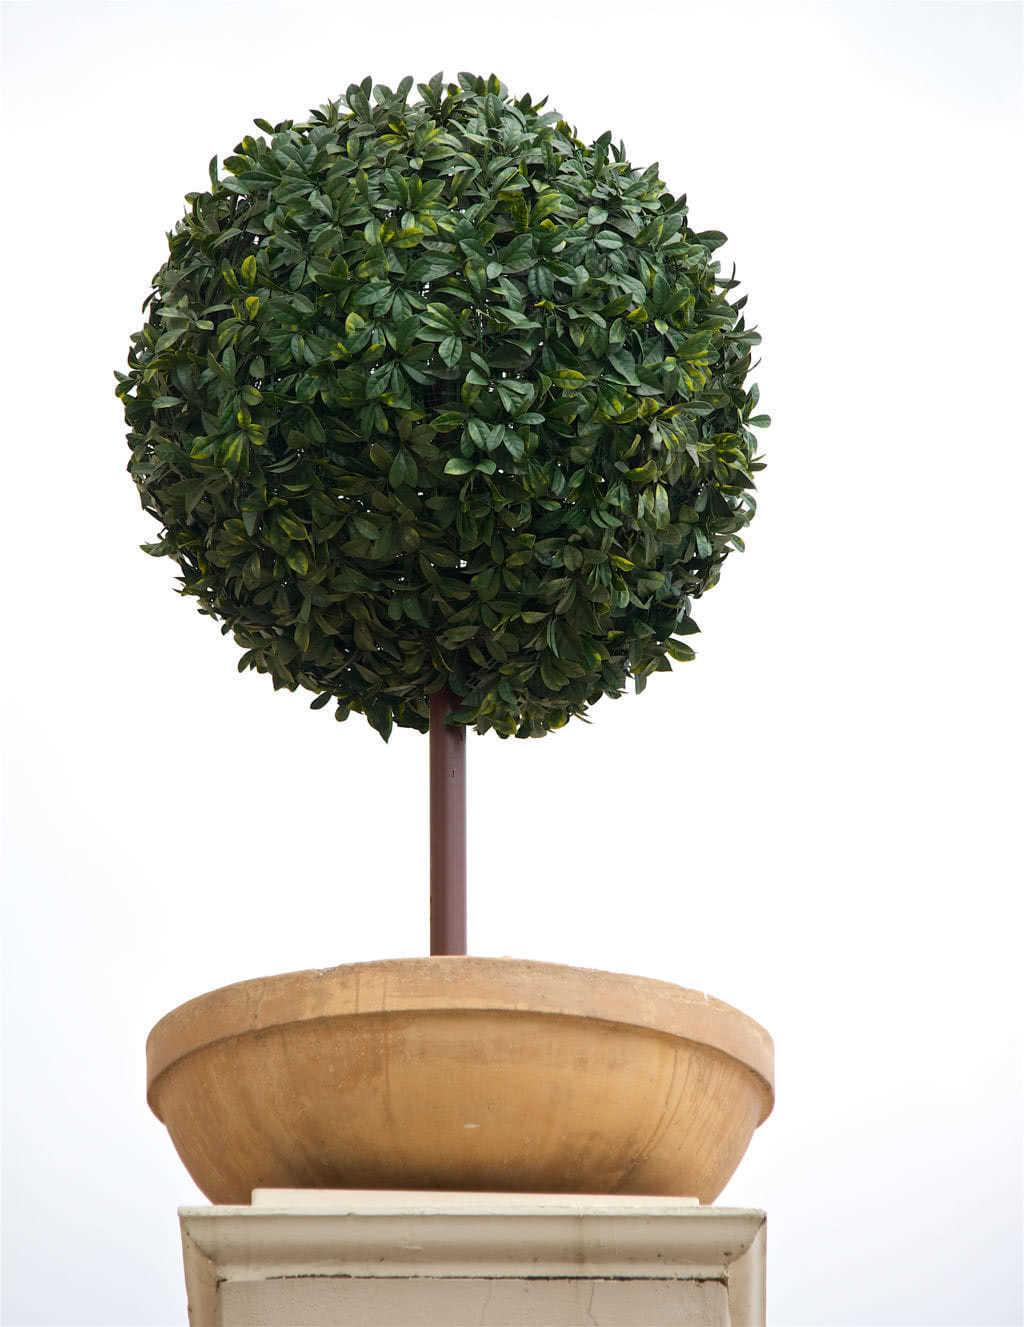 Buy Instagreen Privet Outdoor Topiary 1 0m Diameter Ball On Stem Distinctive Spaces Online Shop